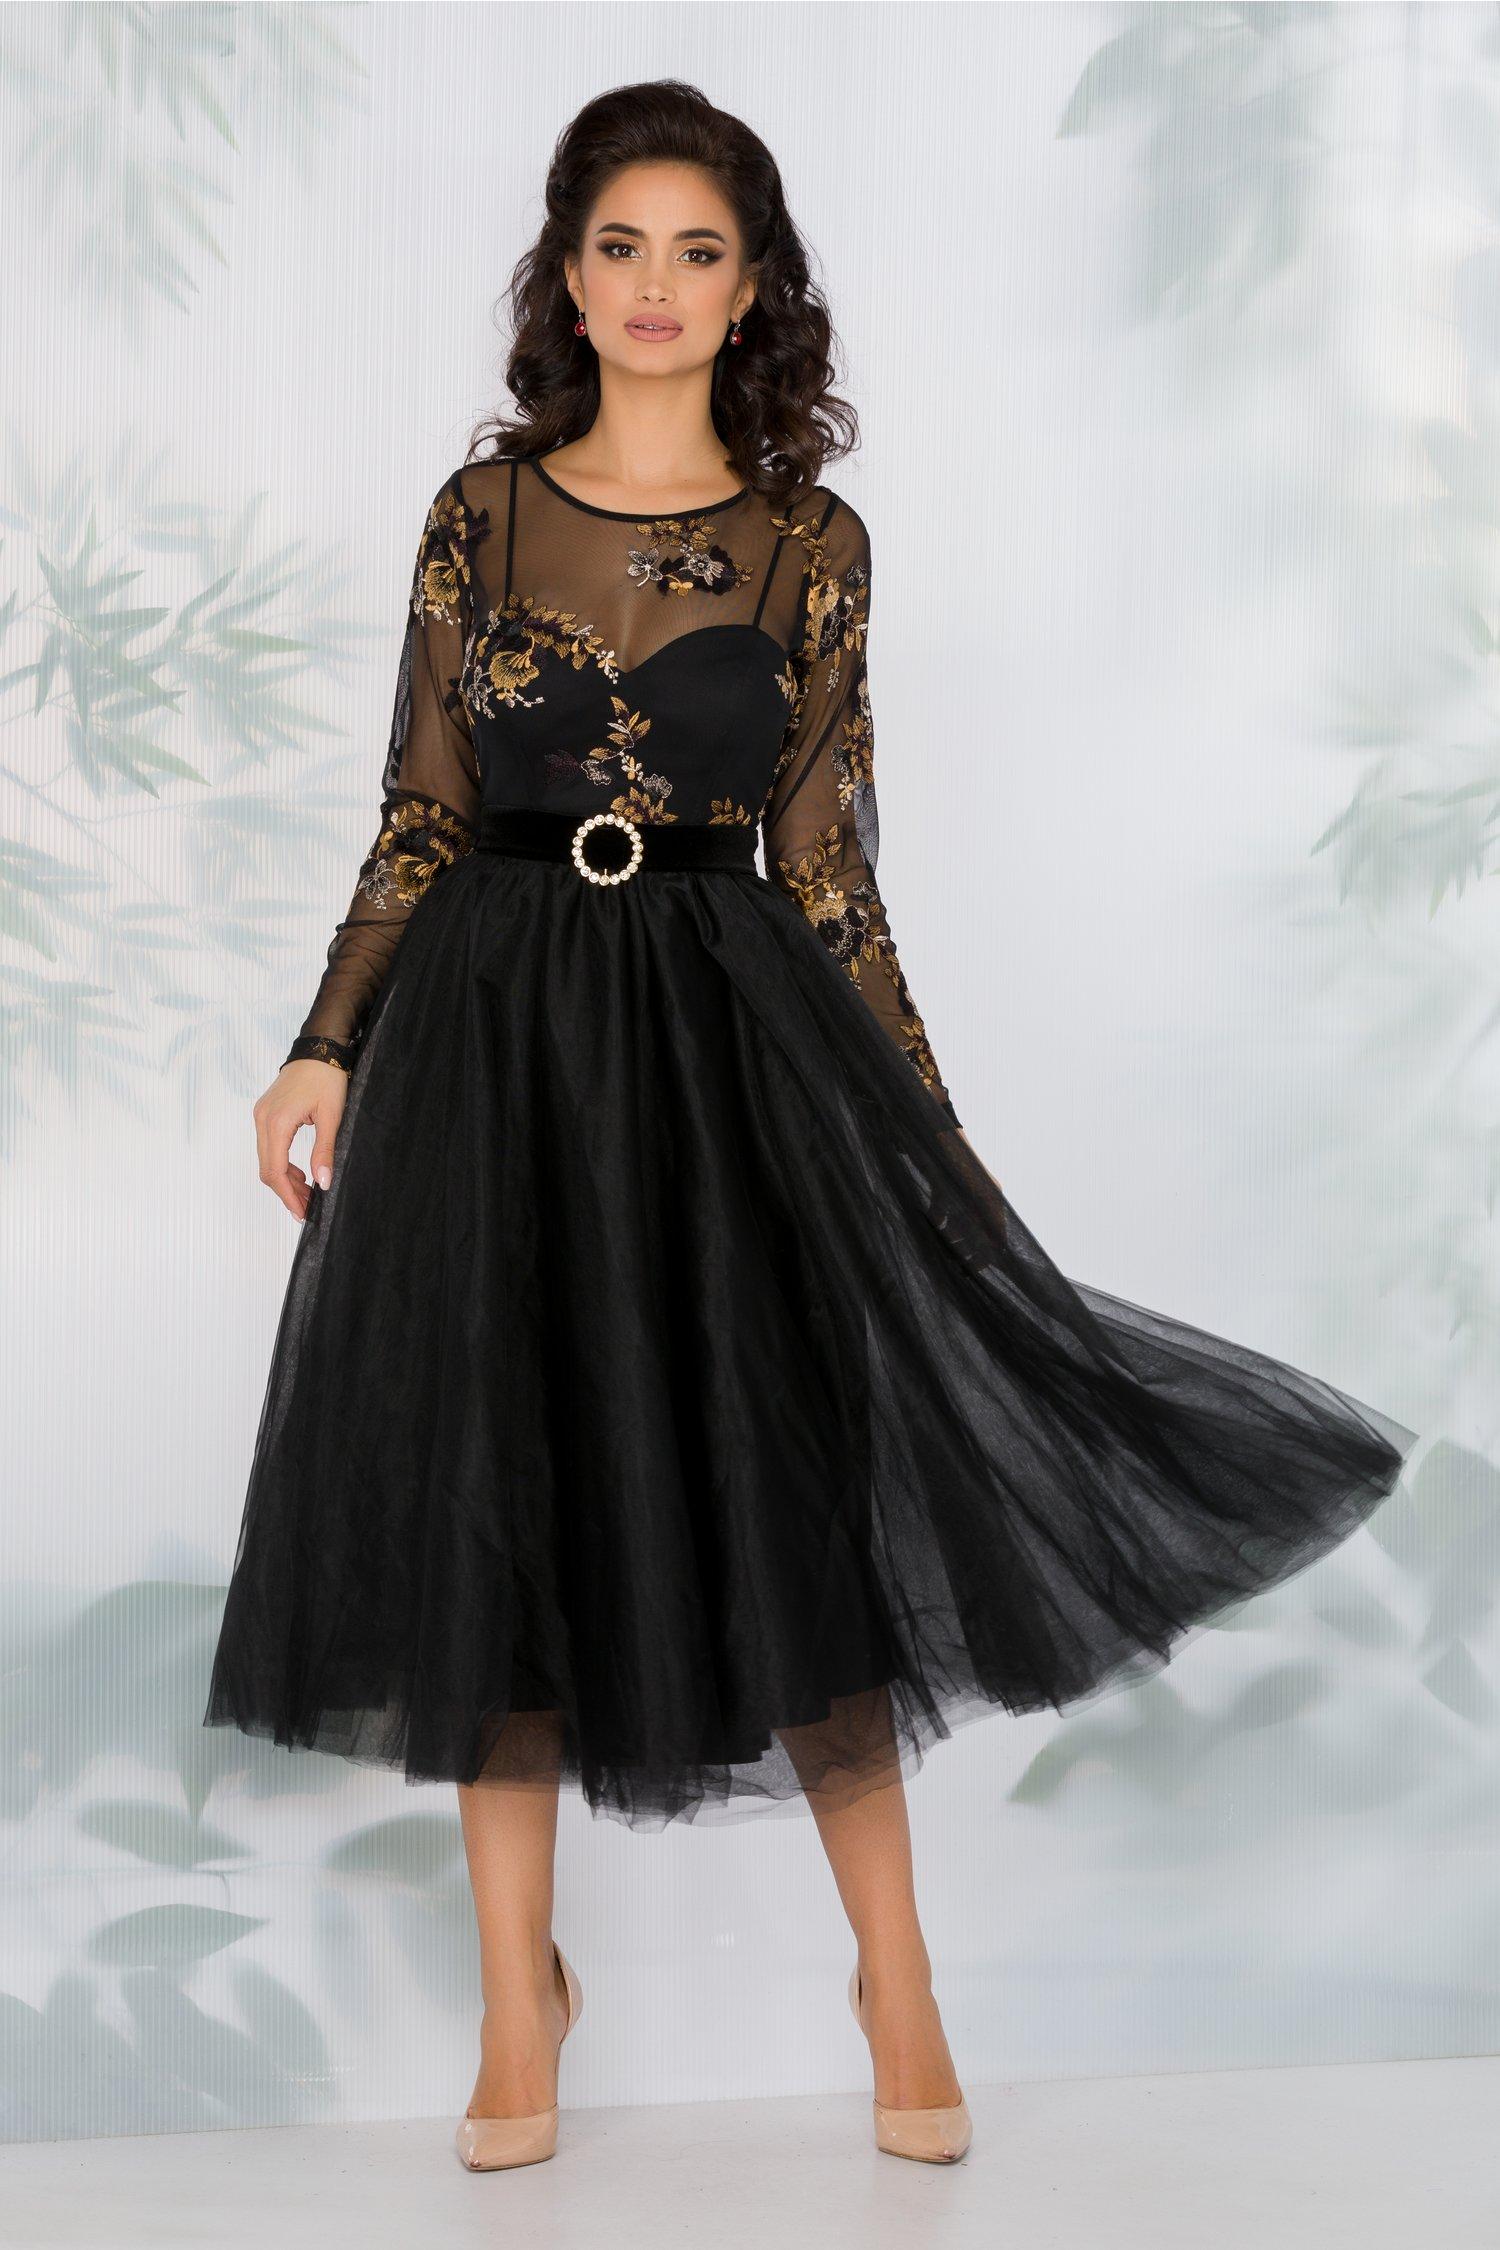 Rochie LaDonna neagra cu fusta din tull si broderie florala galbena la bust